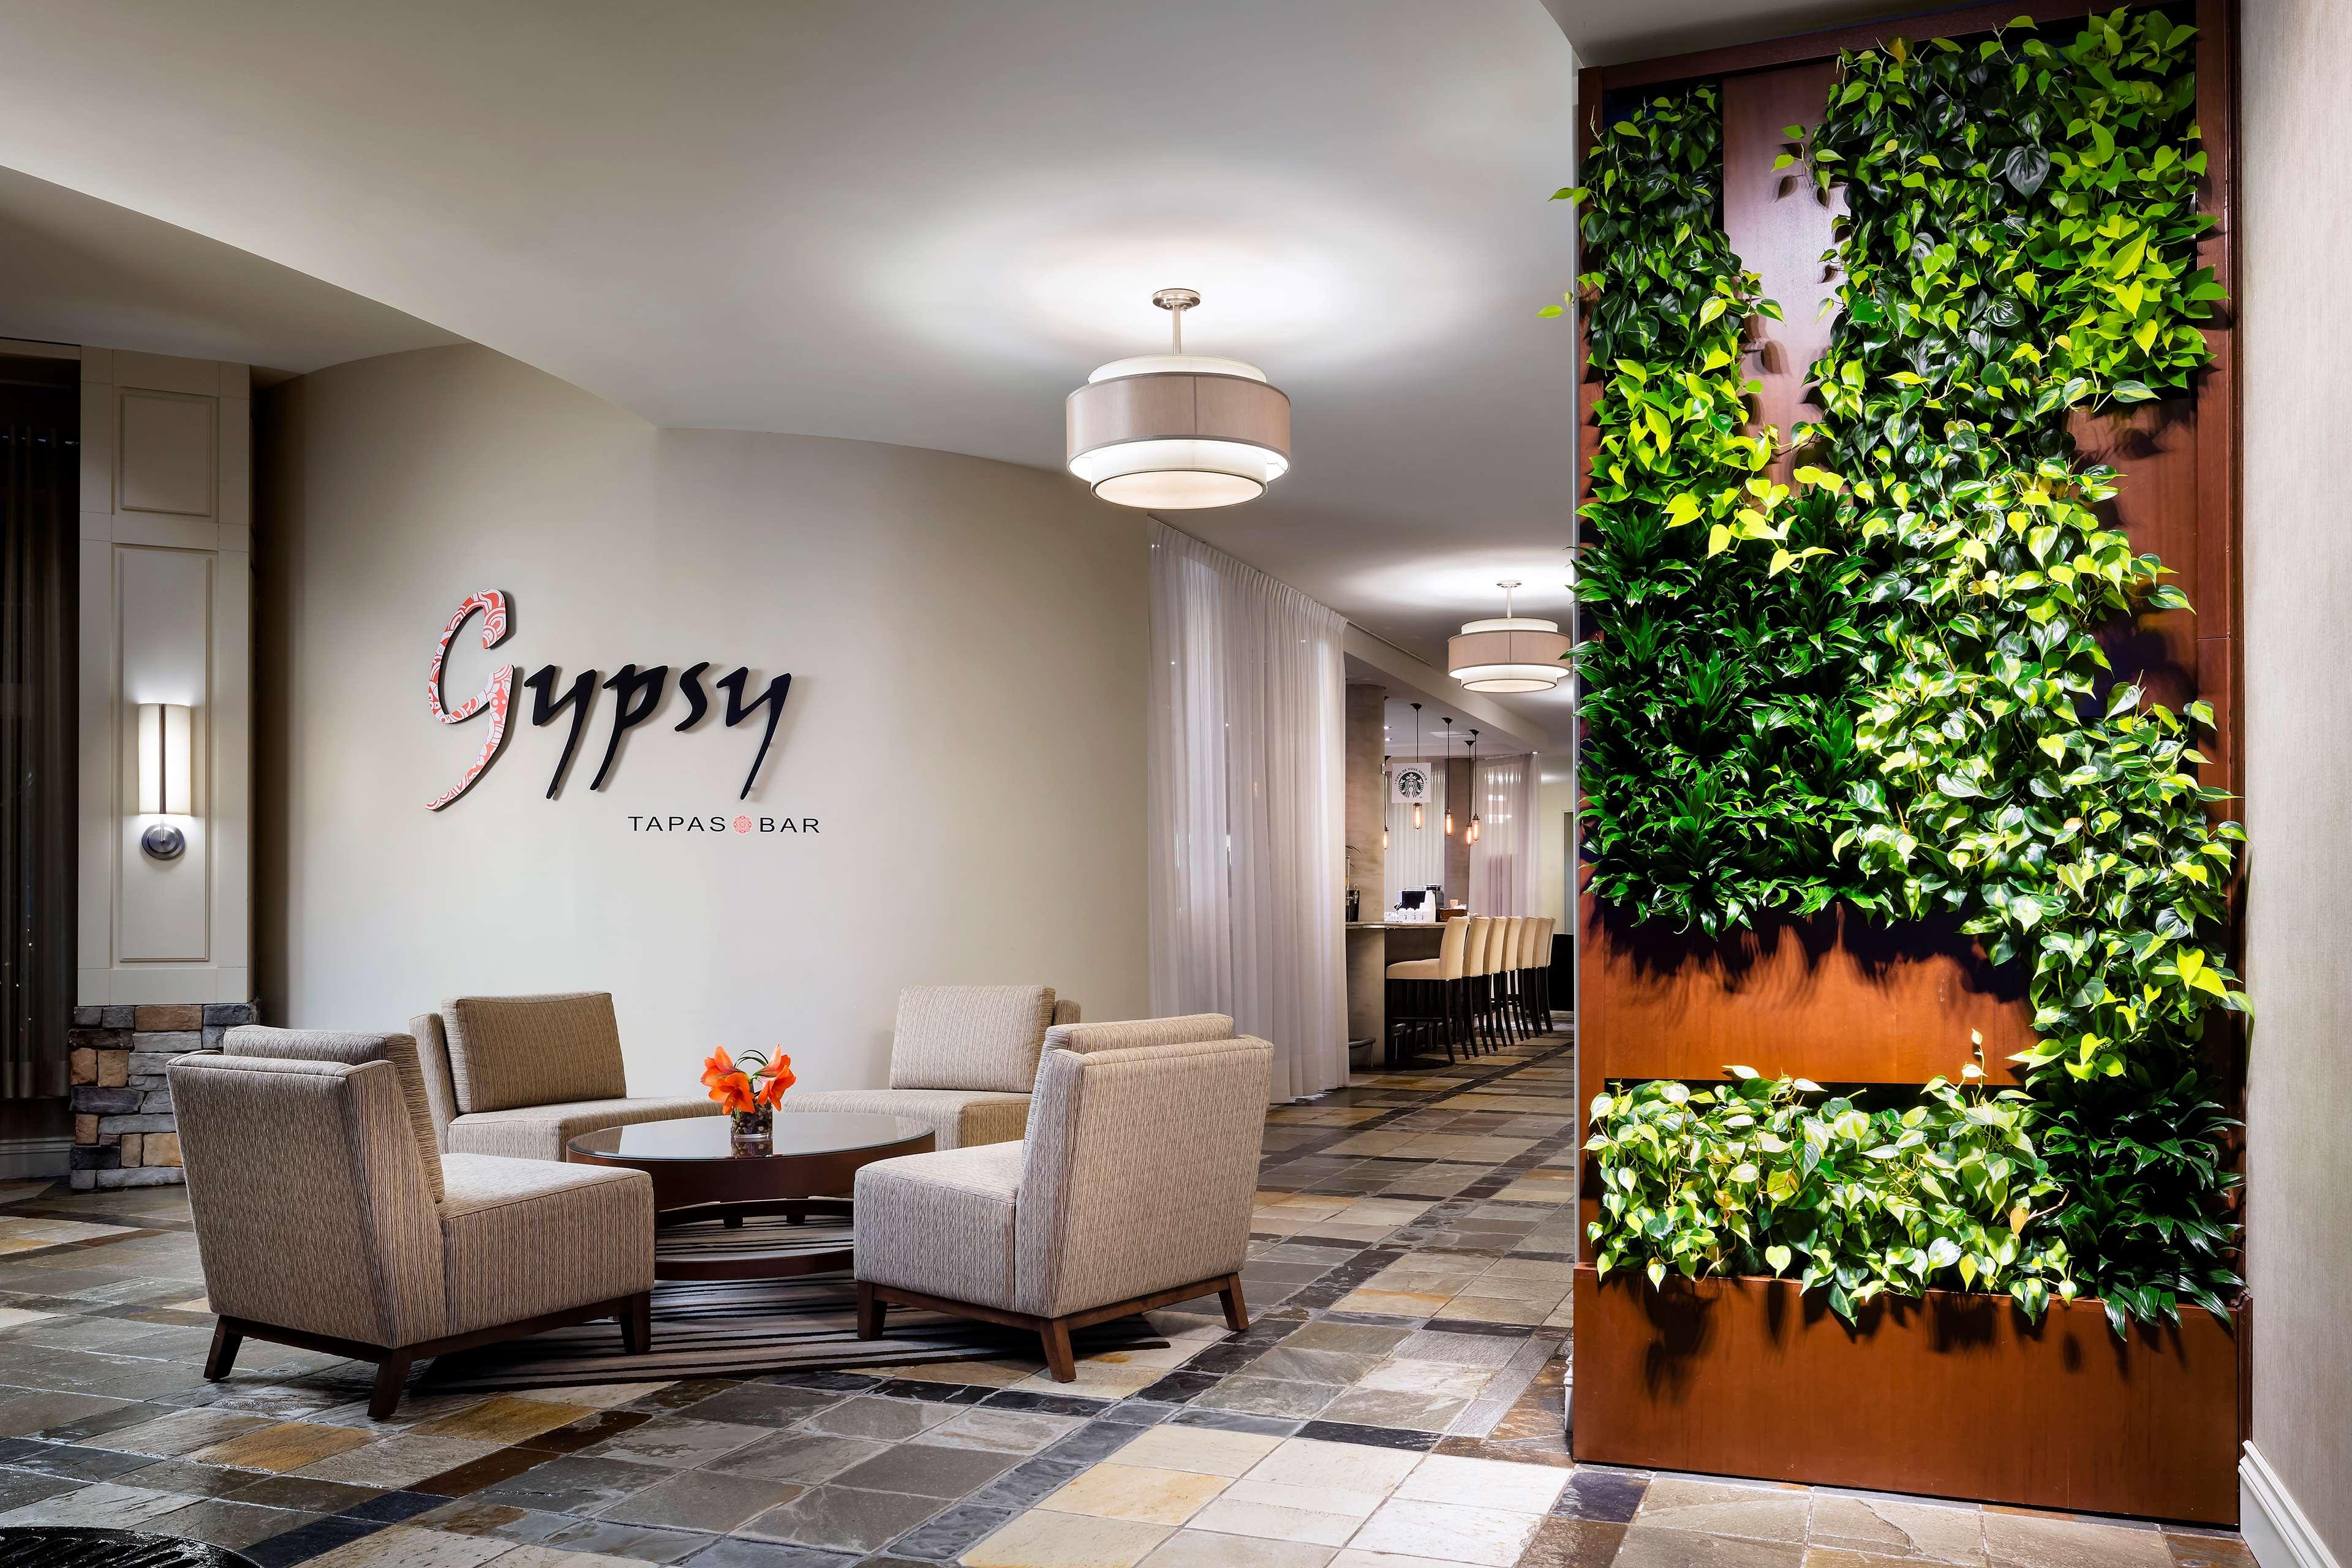 Le Westin Resort & Spa, Tremblant, Quebec à Mont Tremblant: Lobby Green Wall